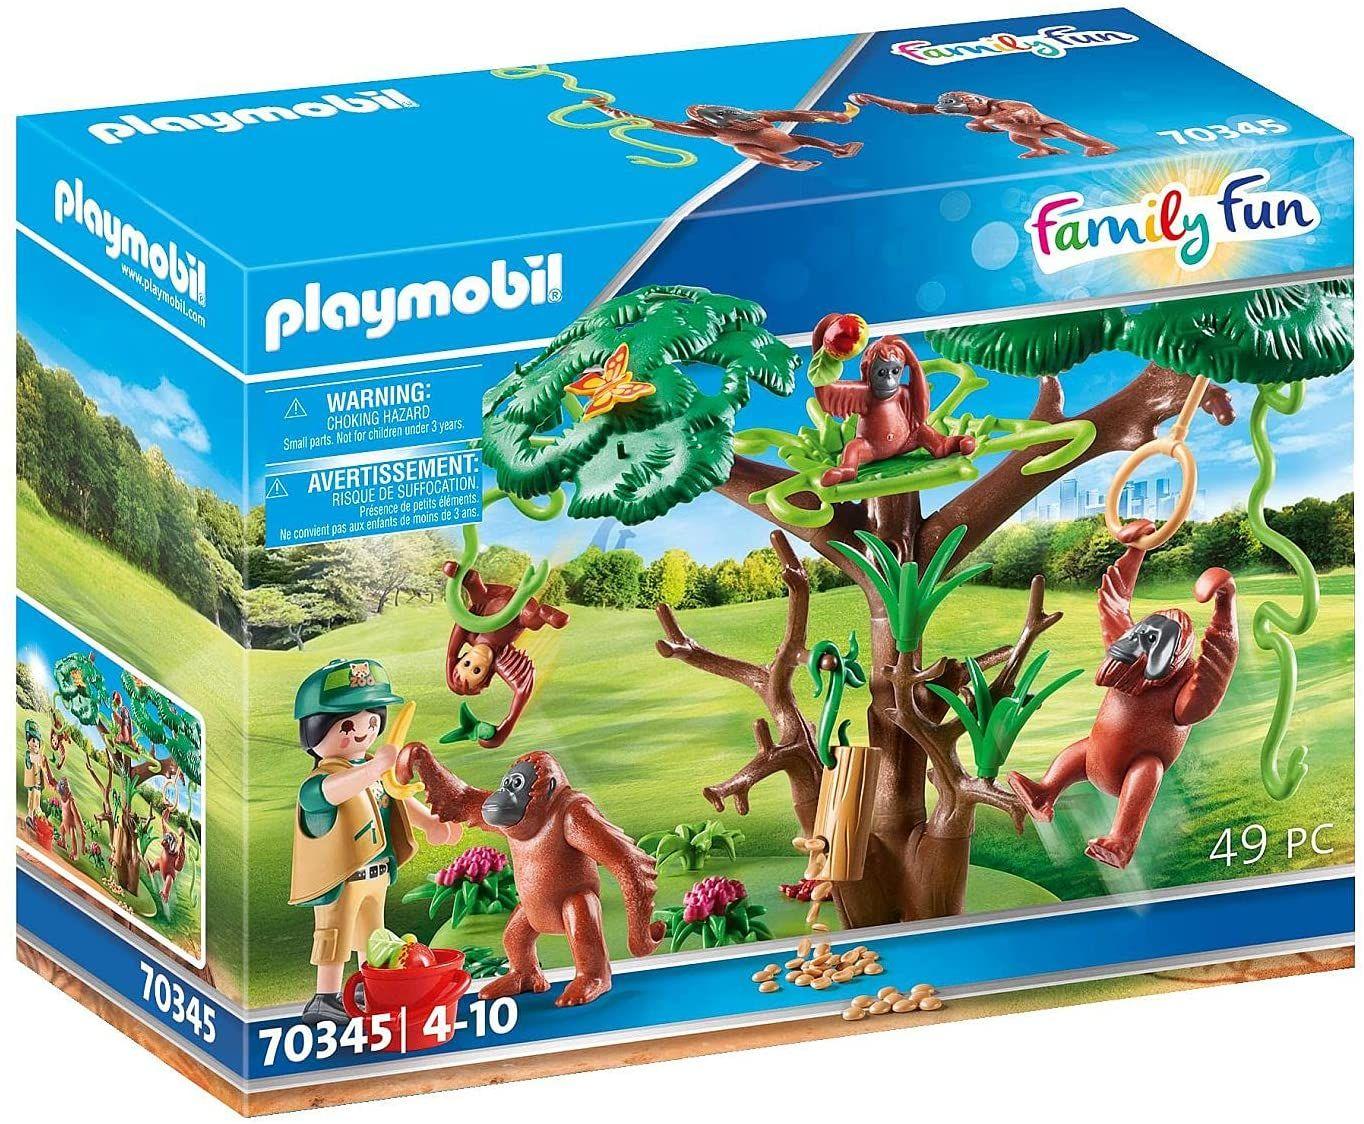 [Prime] PLAYMOBIL Family Fun 70345 Orang Utans im Baum, Ab 4 Jahren, 49 Teile